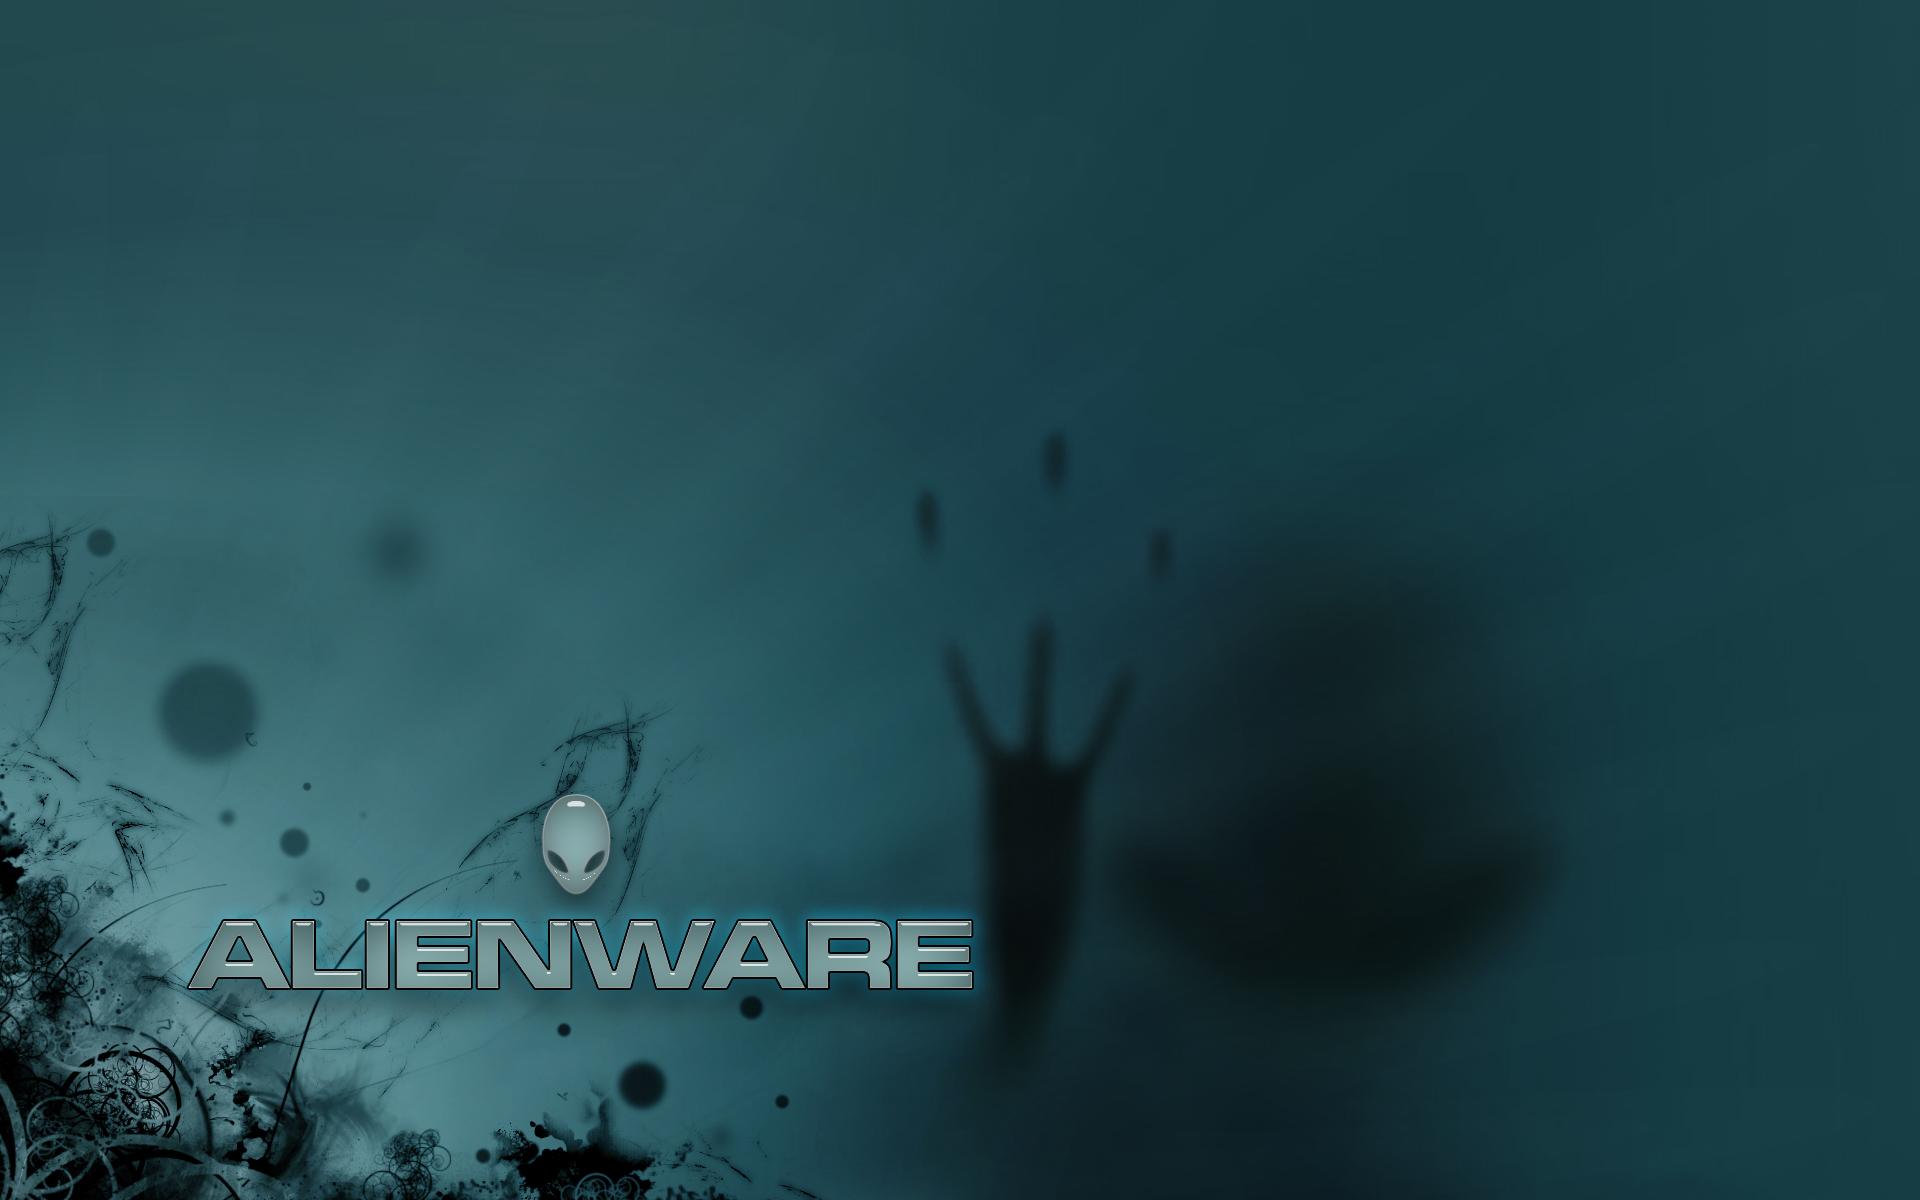 Alienware wallpapers for windows 7 wallpapersafari - Alienware Wallpapers For Windows 7 Wallpapersafari